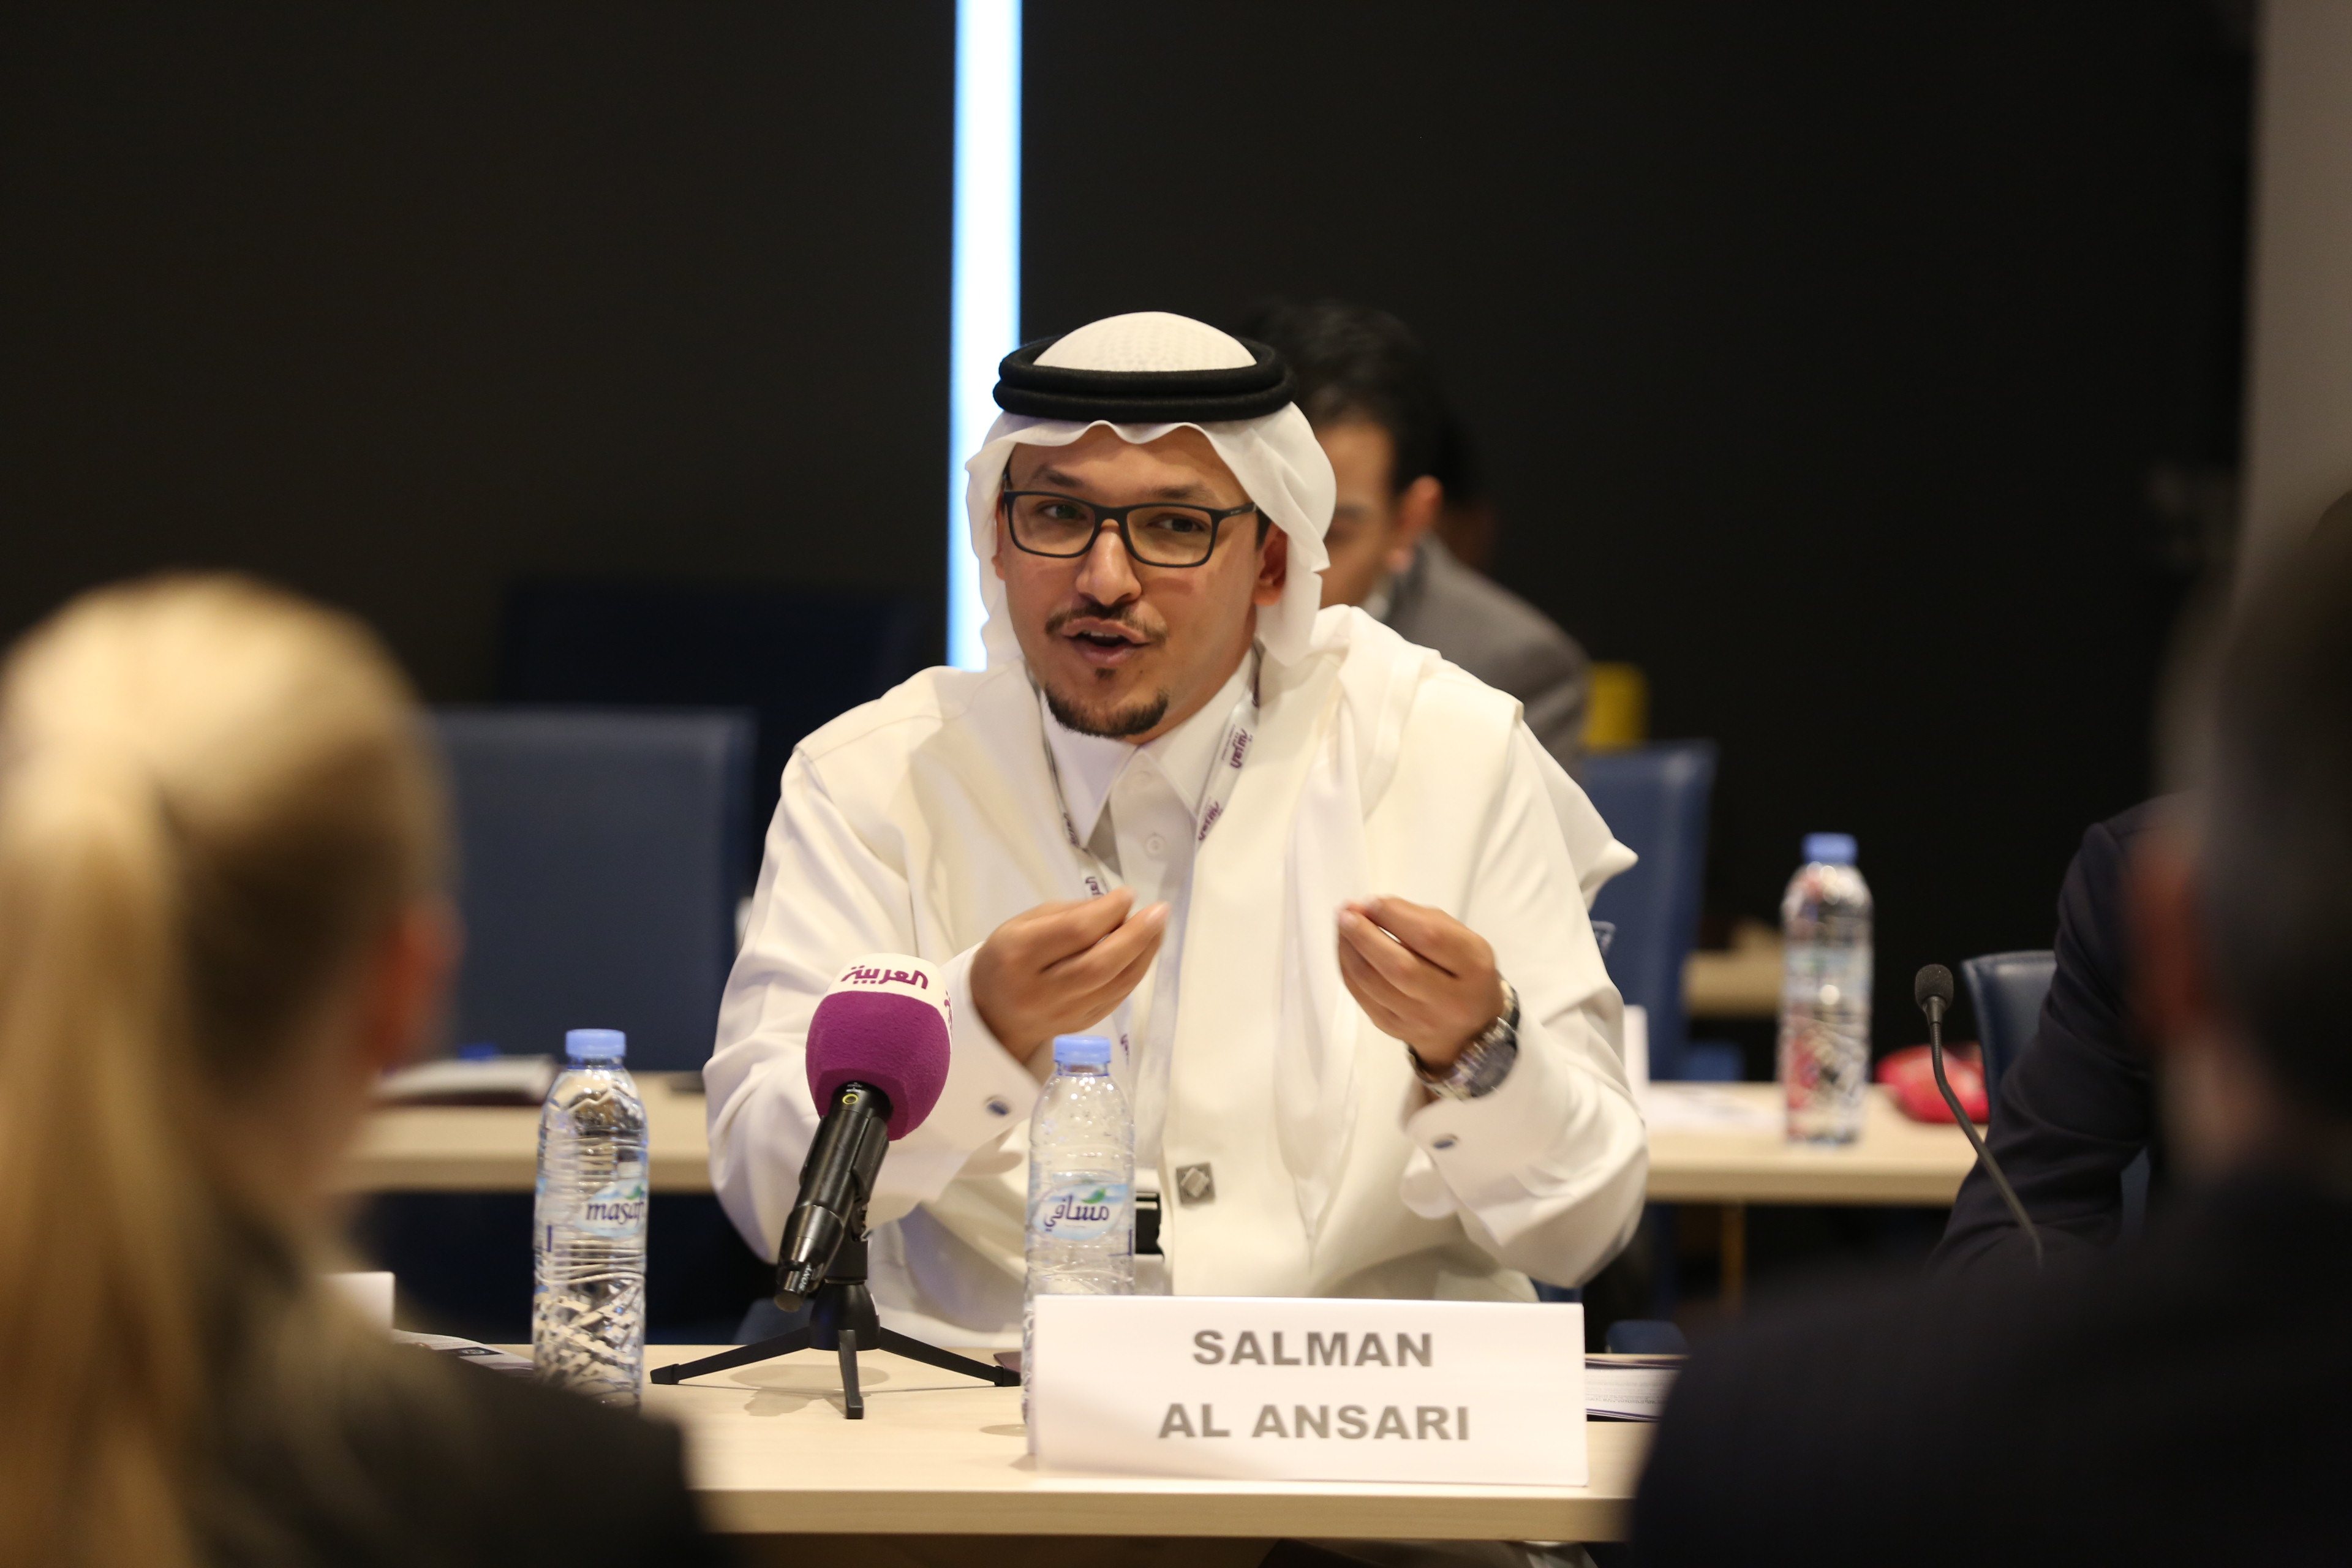 Salman al Ansari